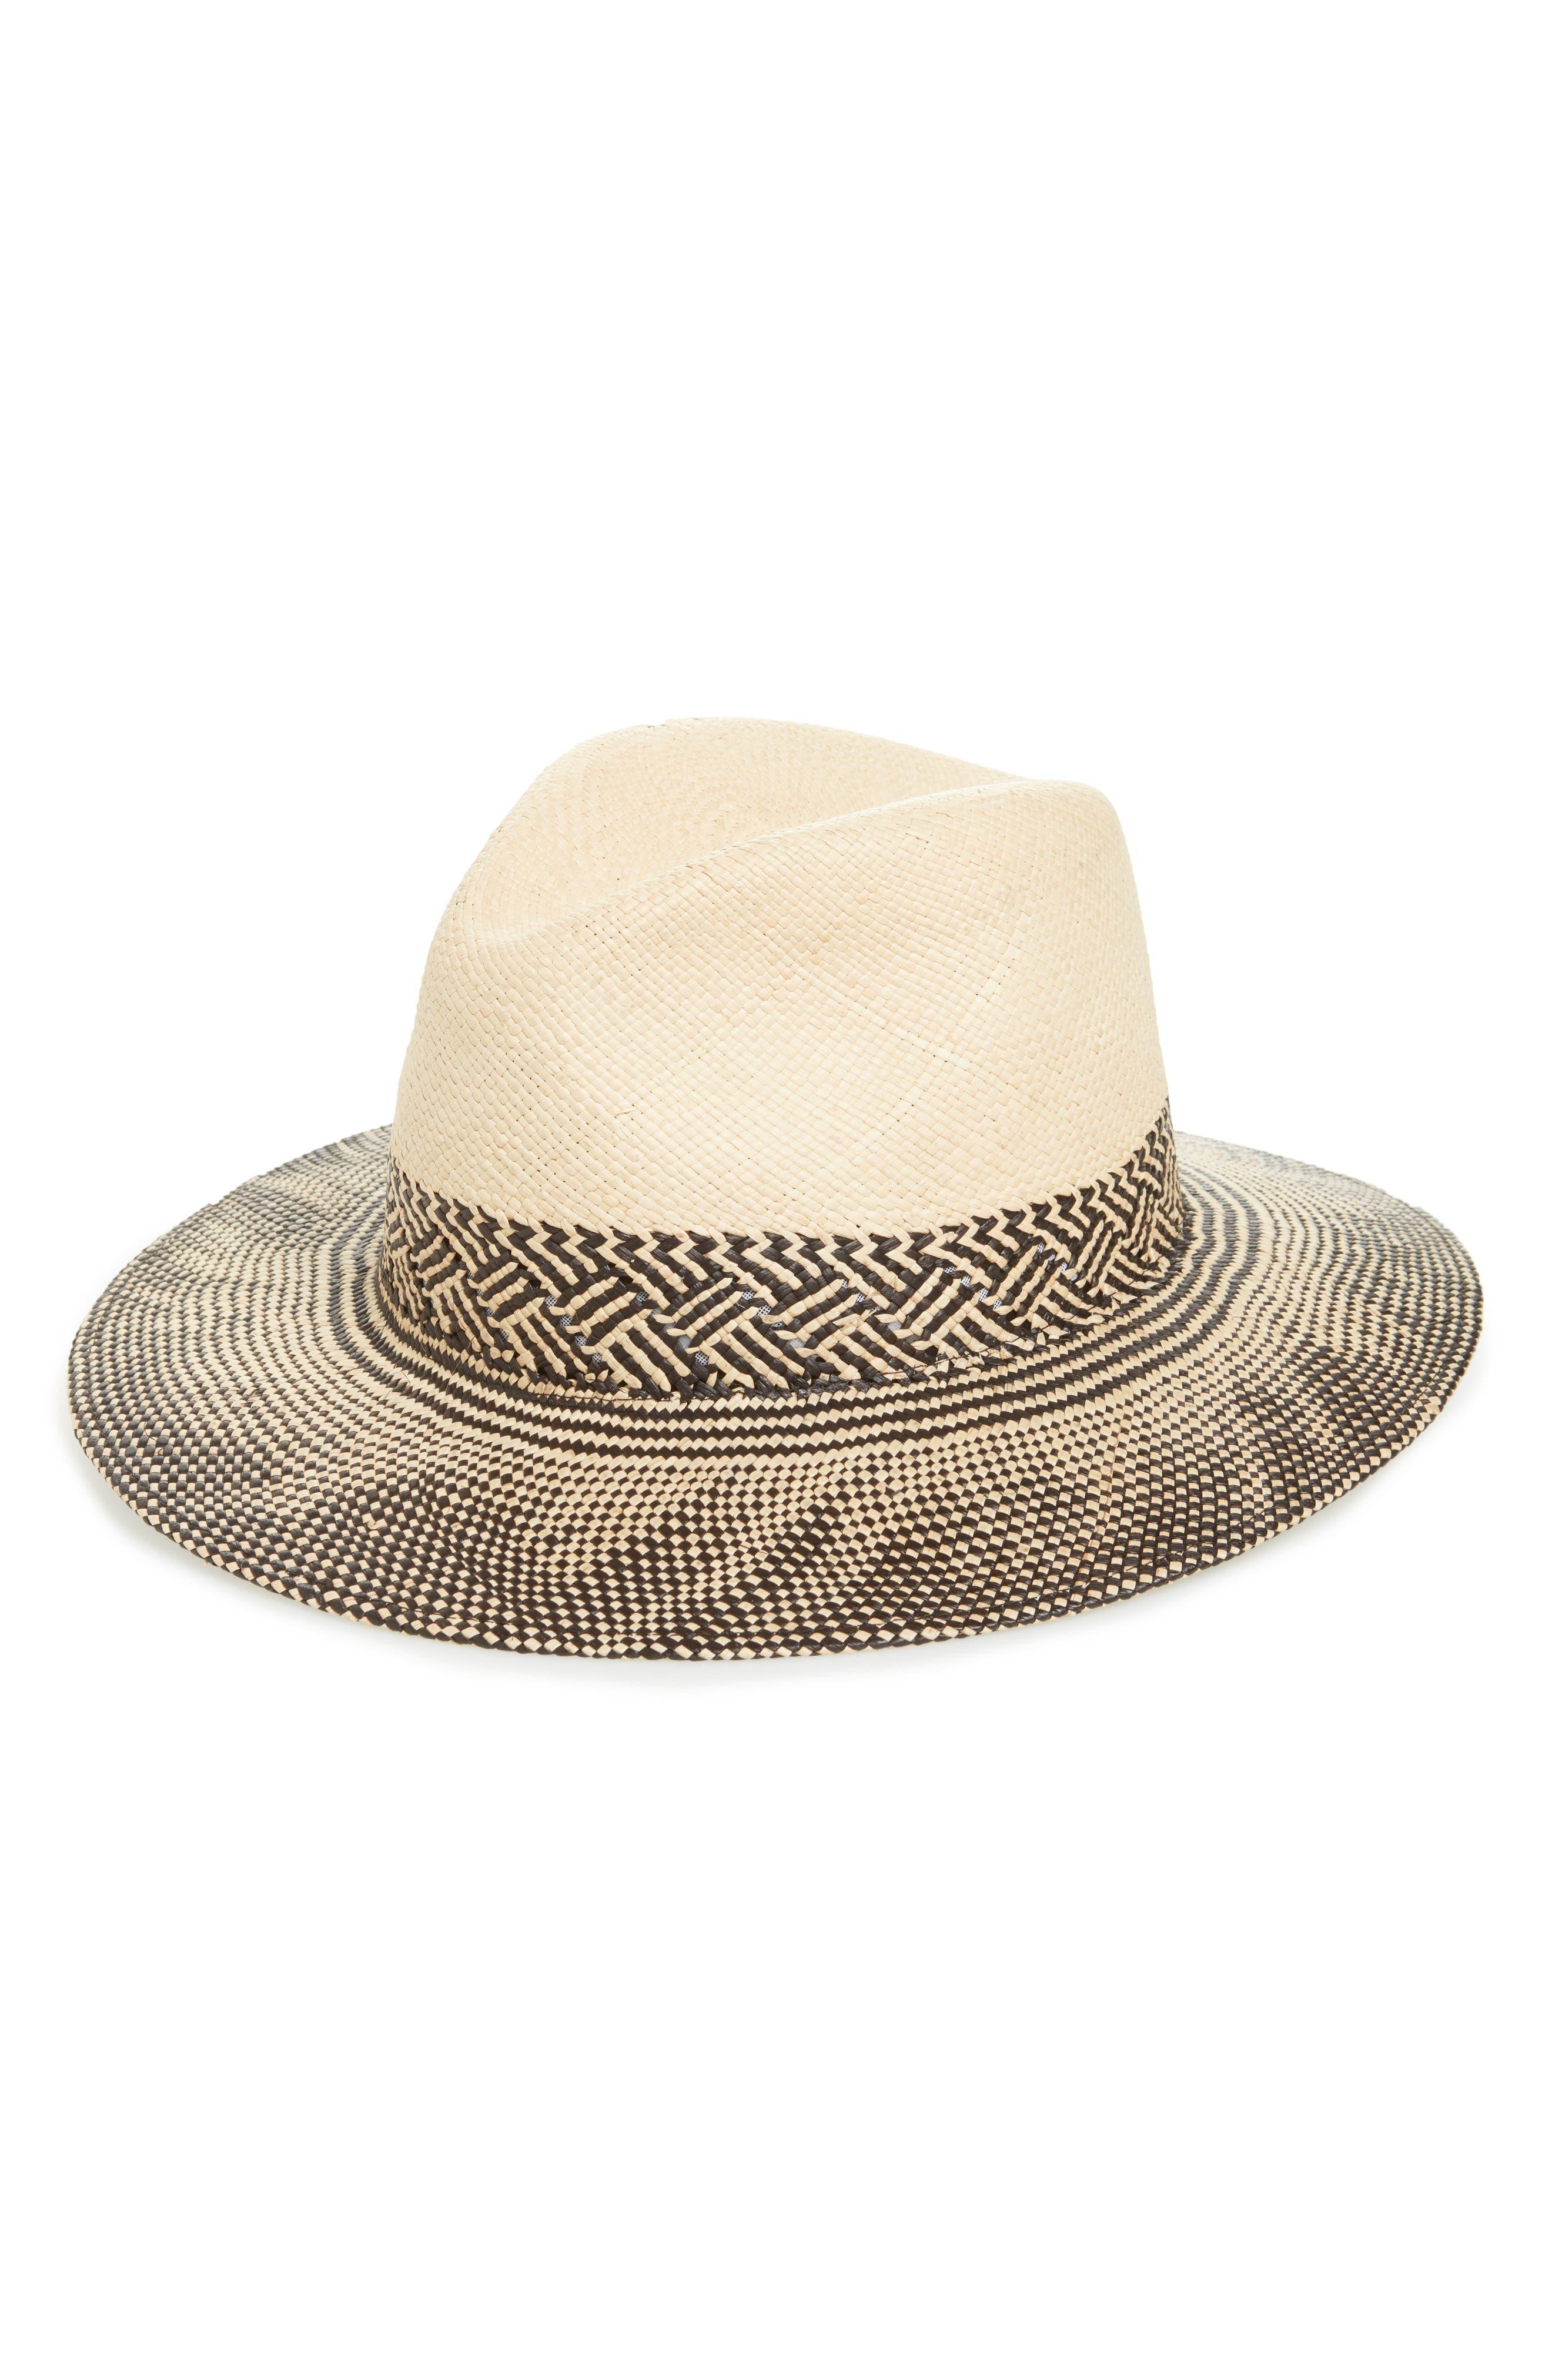 Alternate Image 1 Selected - rag & bone Straw Panama Hat